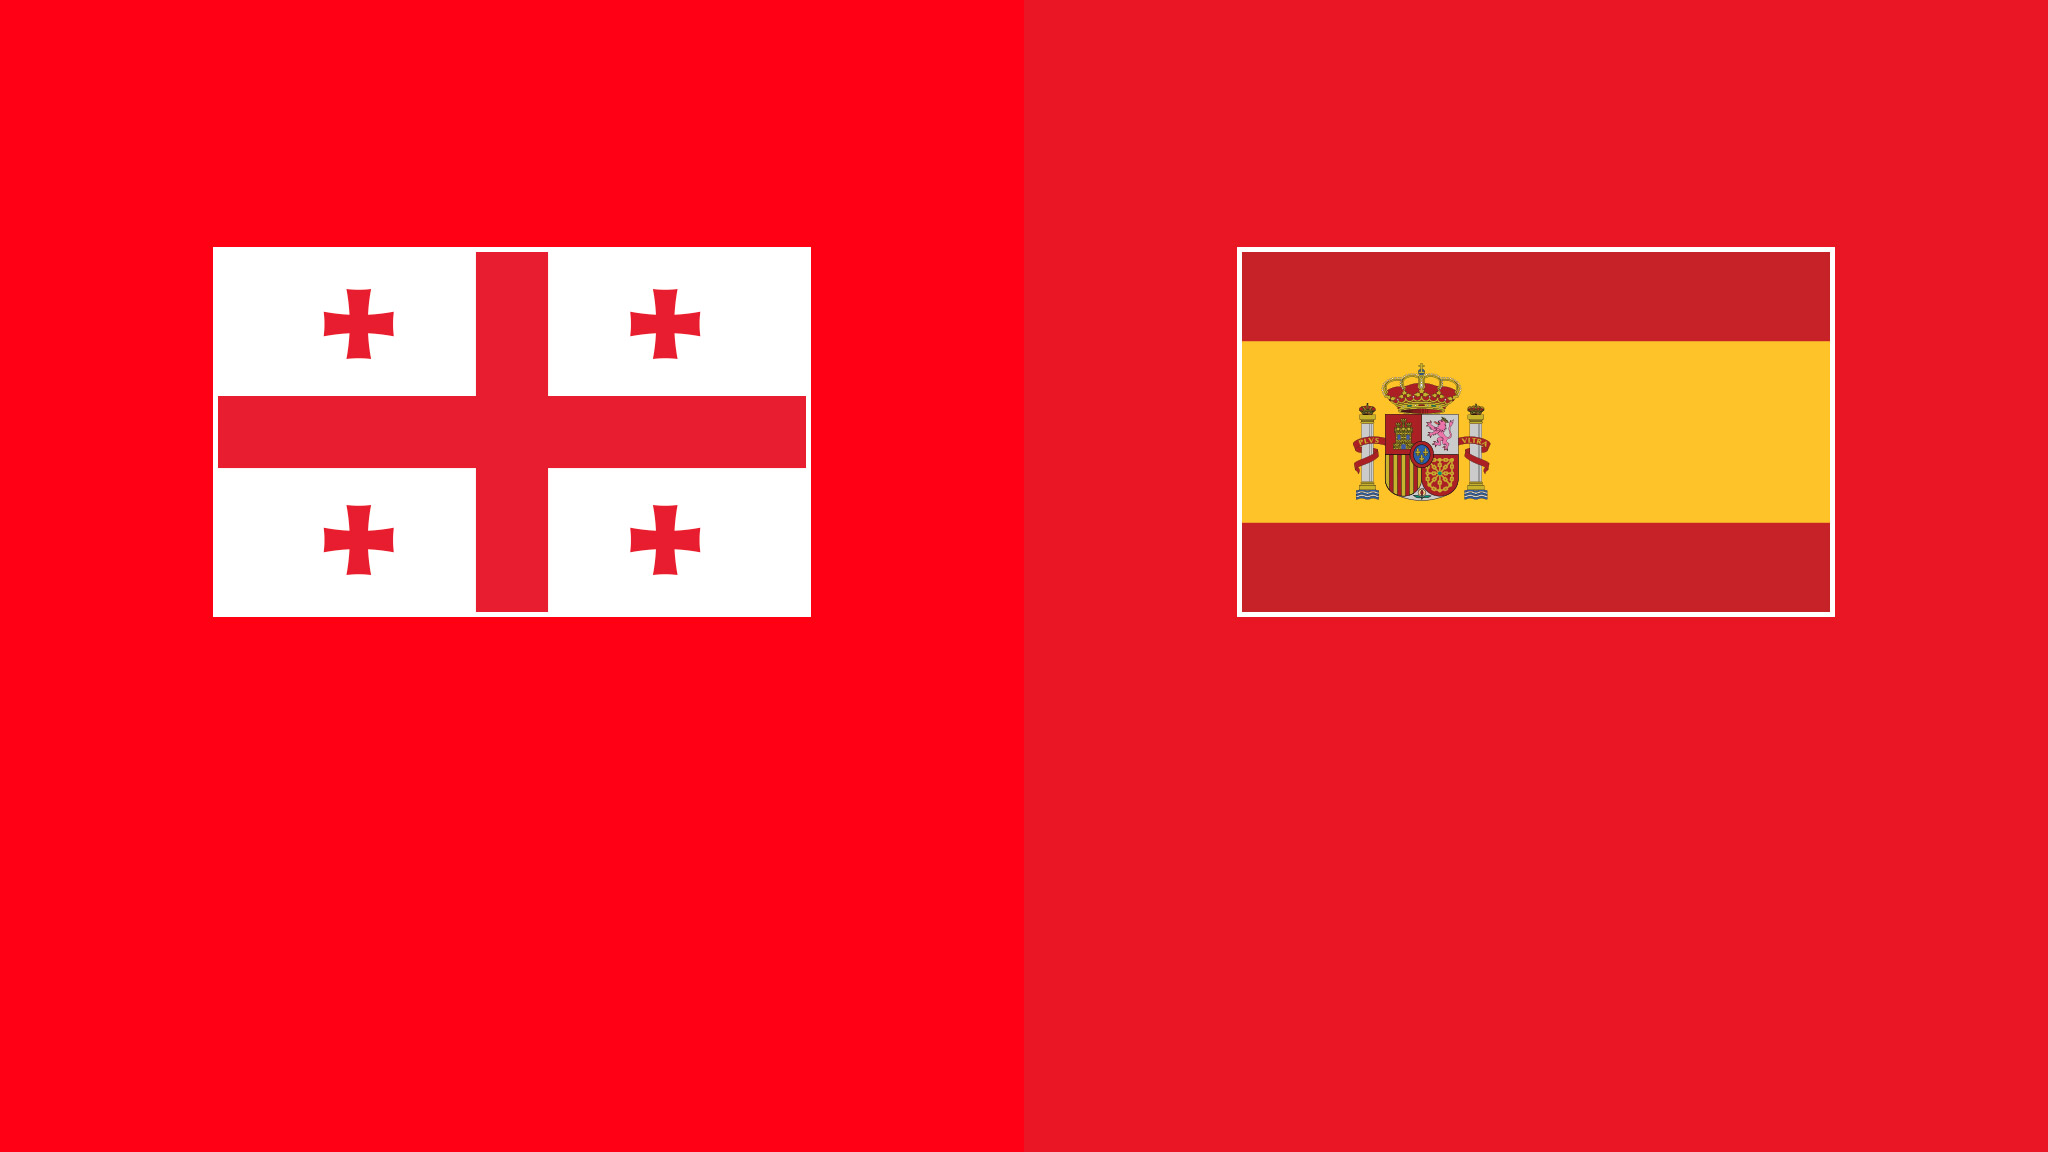 Georgia vs spain